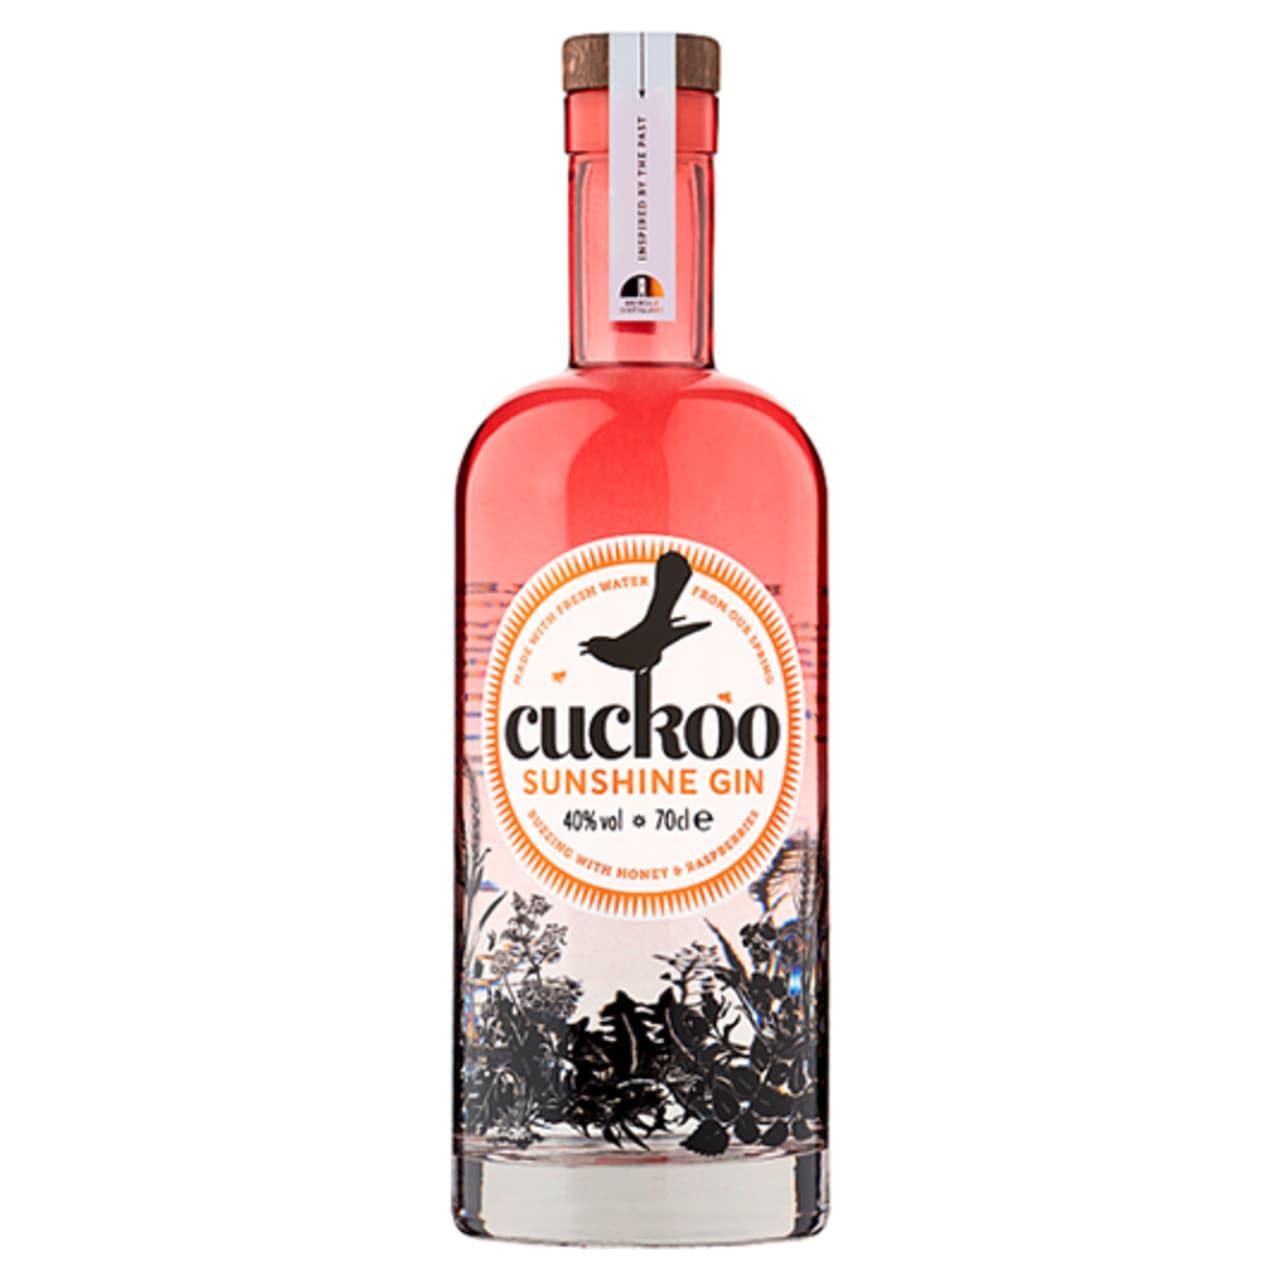 Product Image - Cuckoo Sunshine Gin